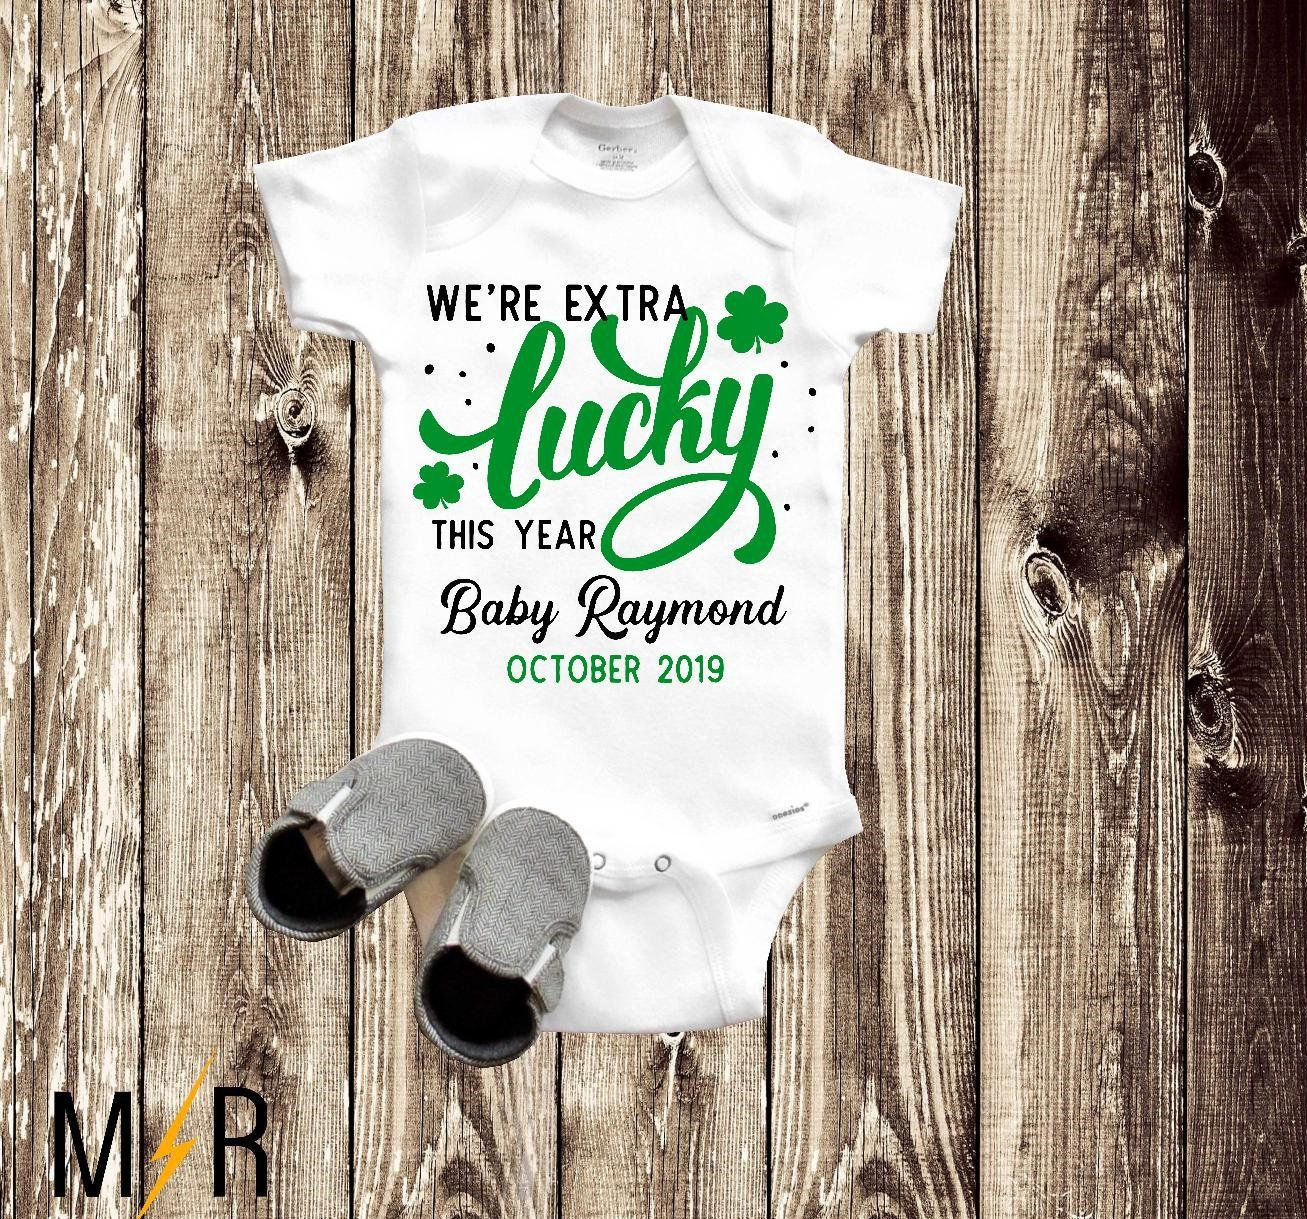 Baby Reveal Irish Extra Lucky This Year St Patrick/'s Day Onesie\u00ae St Patrick/'s Day Pregnancy Announcement Pregnancy Announcement